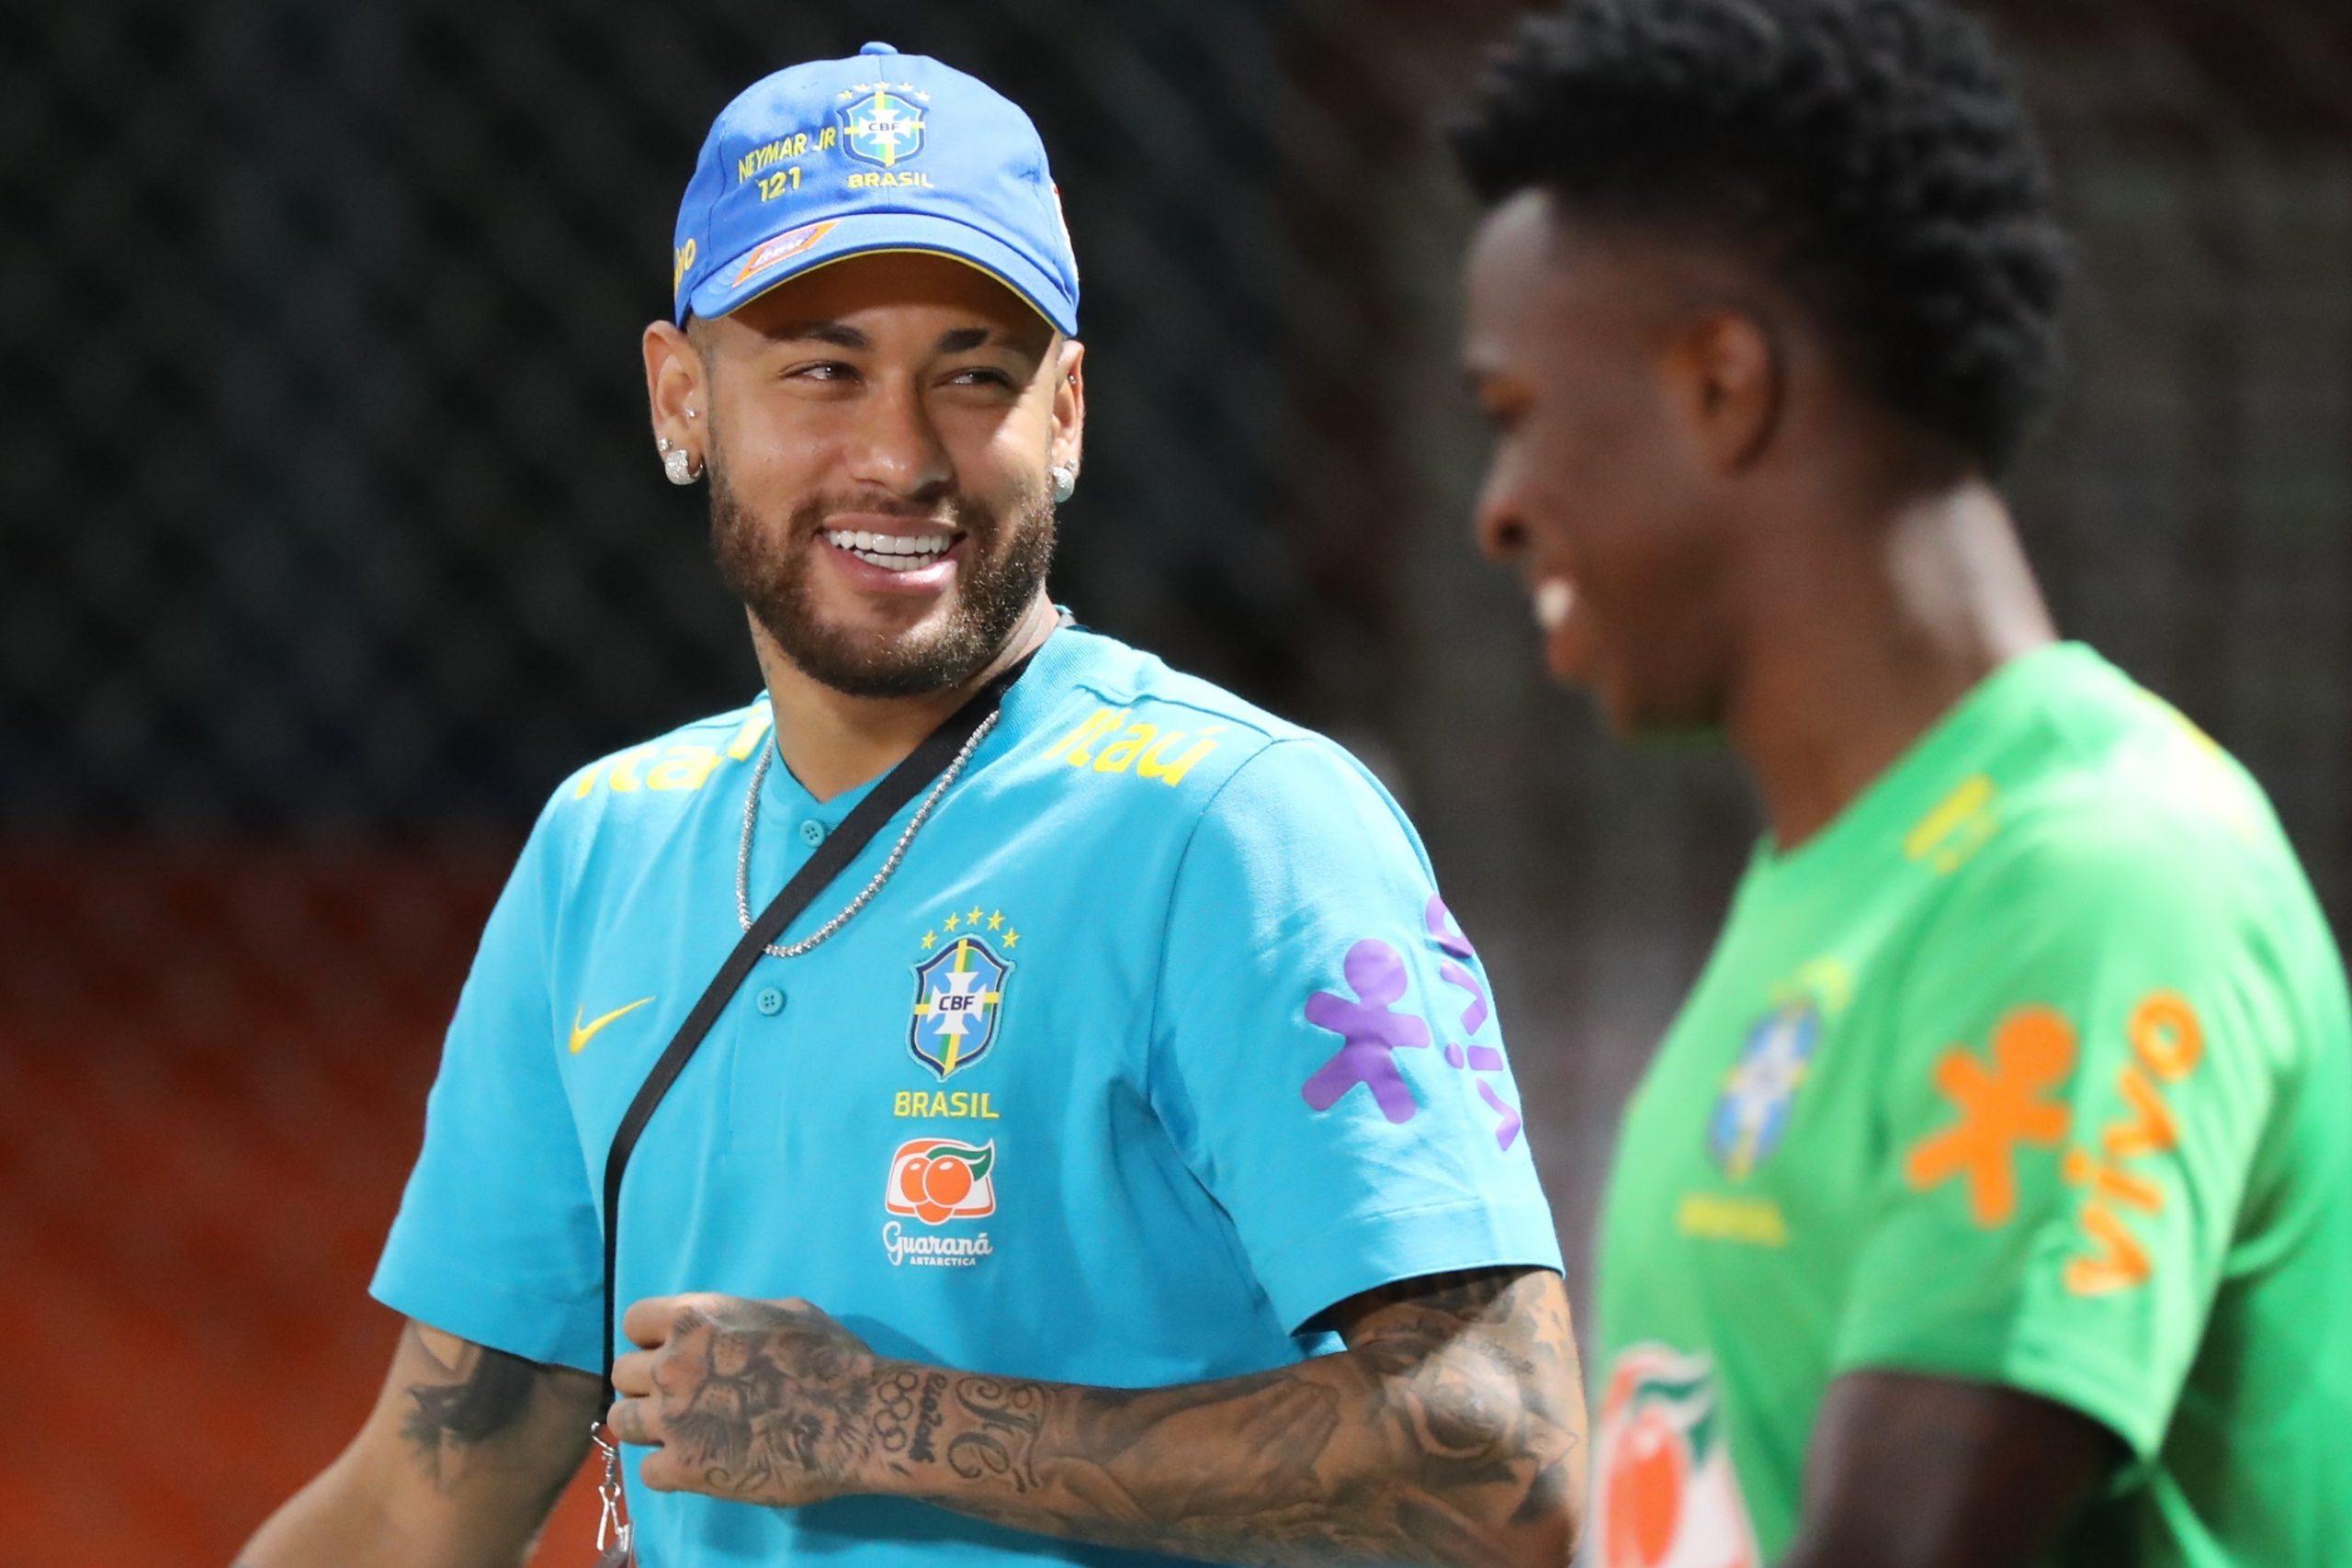 'Creo que será mi último Mundial', dice Neymar de Qatar-2022 - Prensa Libre